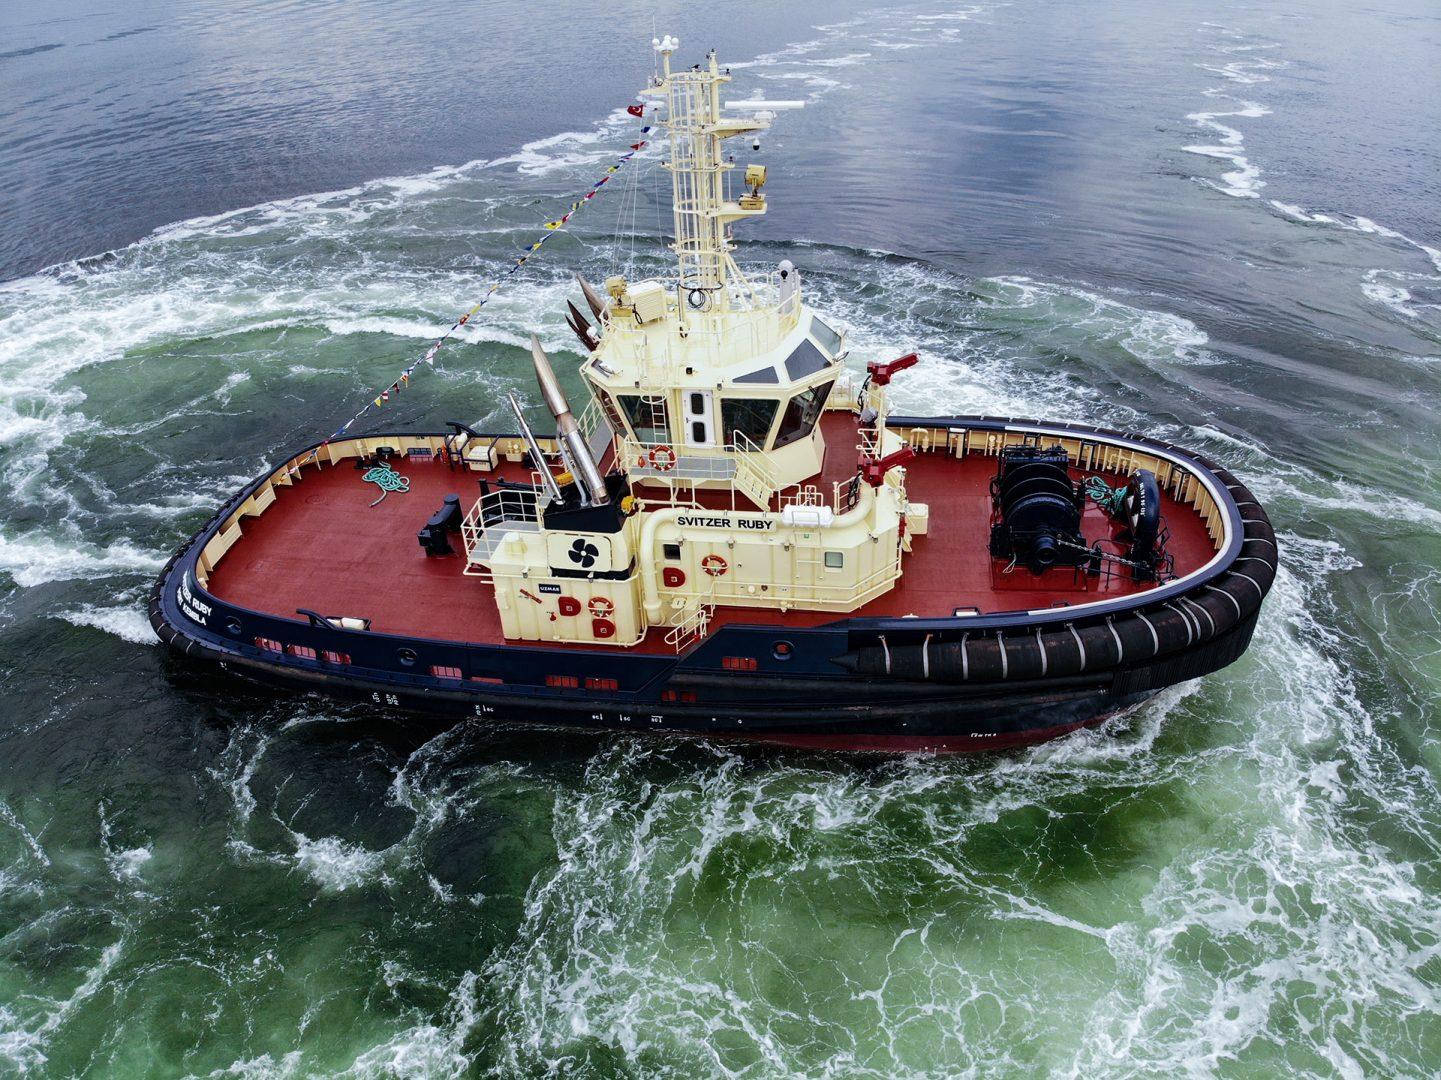 Svitzer Australia Welcomes Tugs to Port Kembla, Fremantle